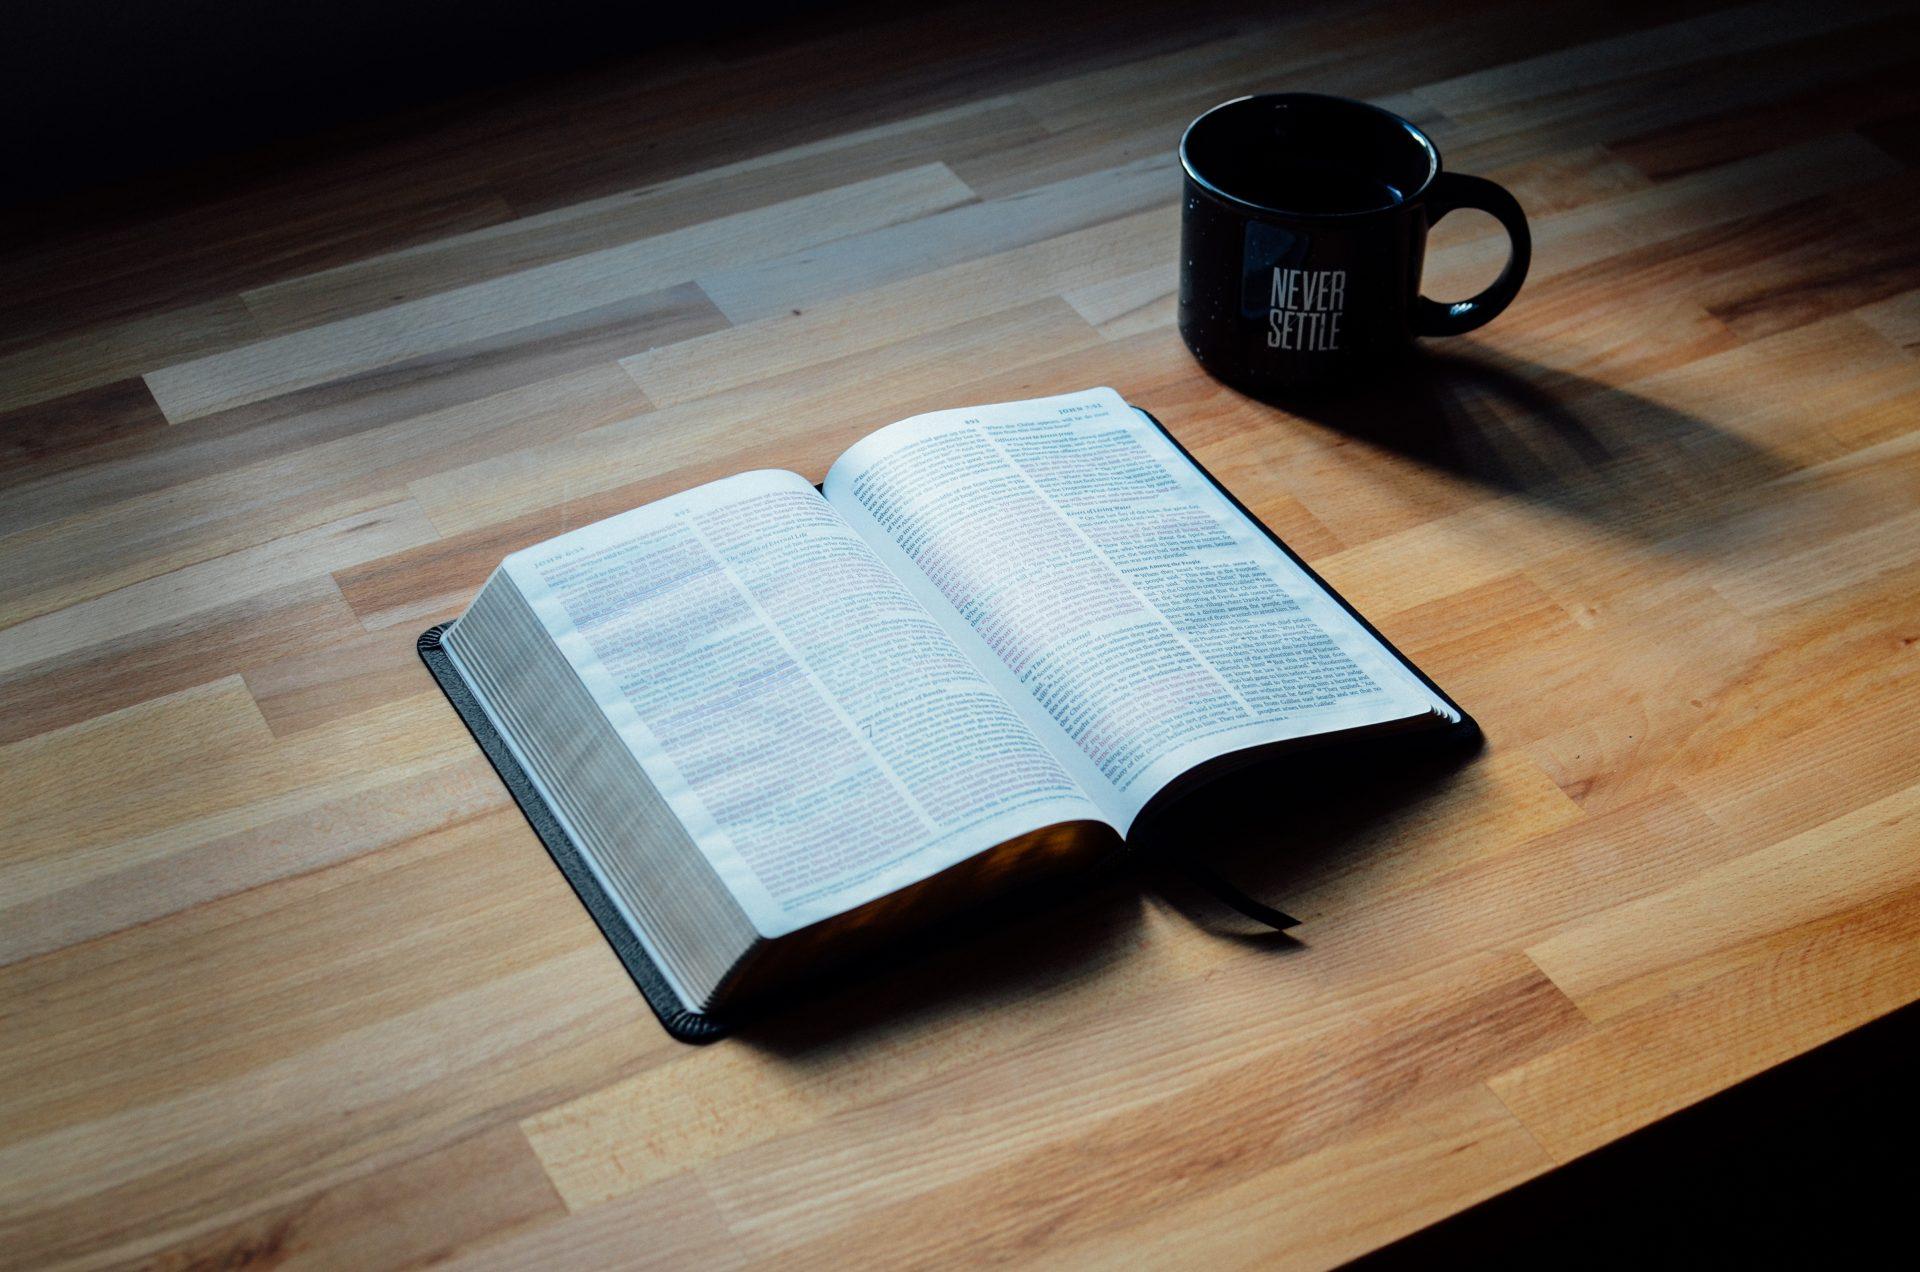 8 Razones Para Amar La Sana Doctrina - Una foto de la Biblia